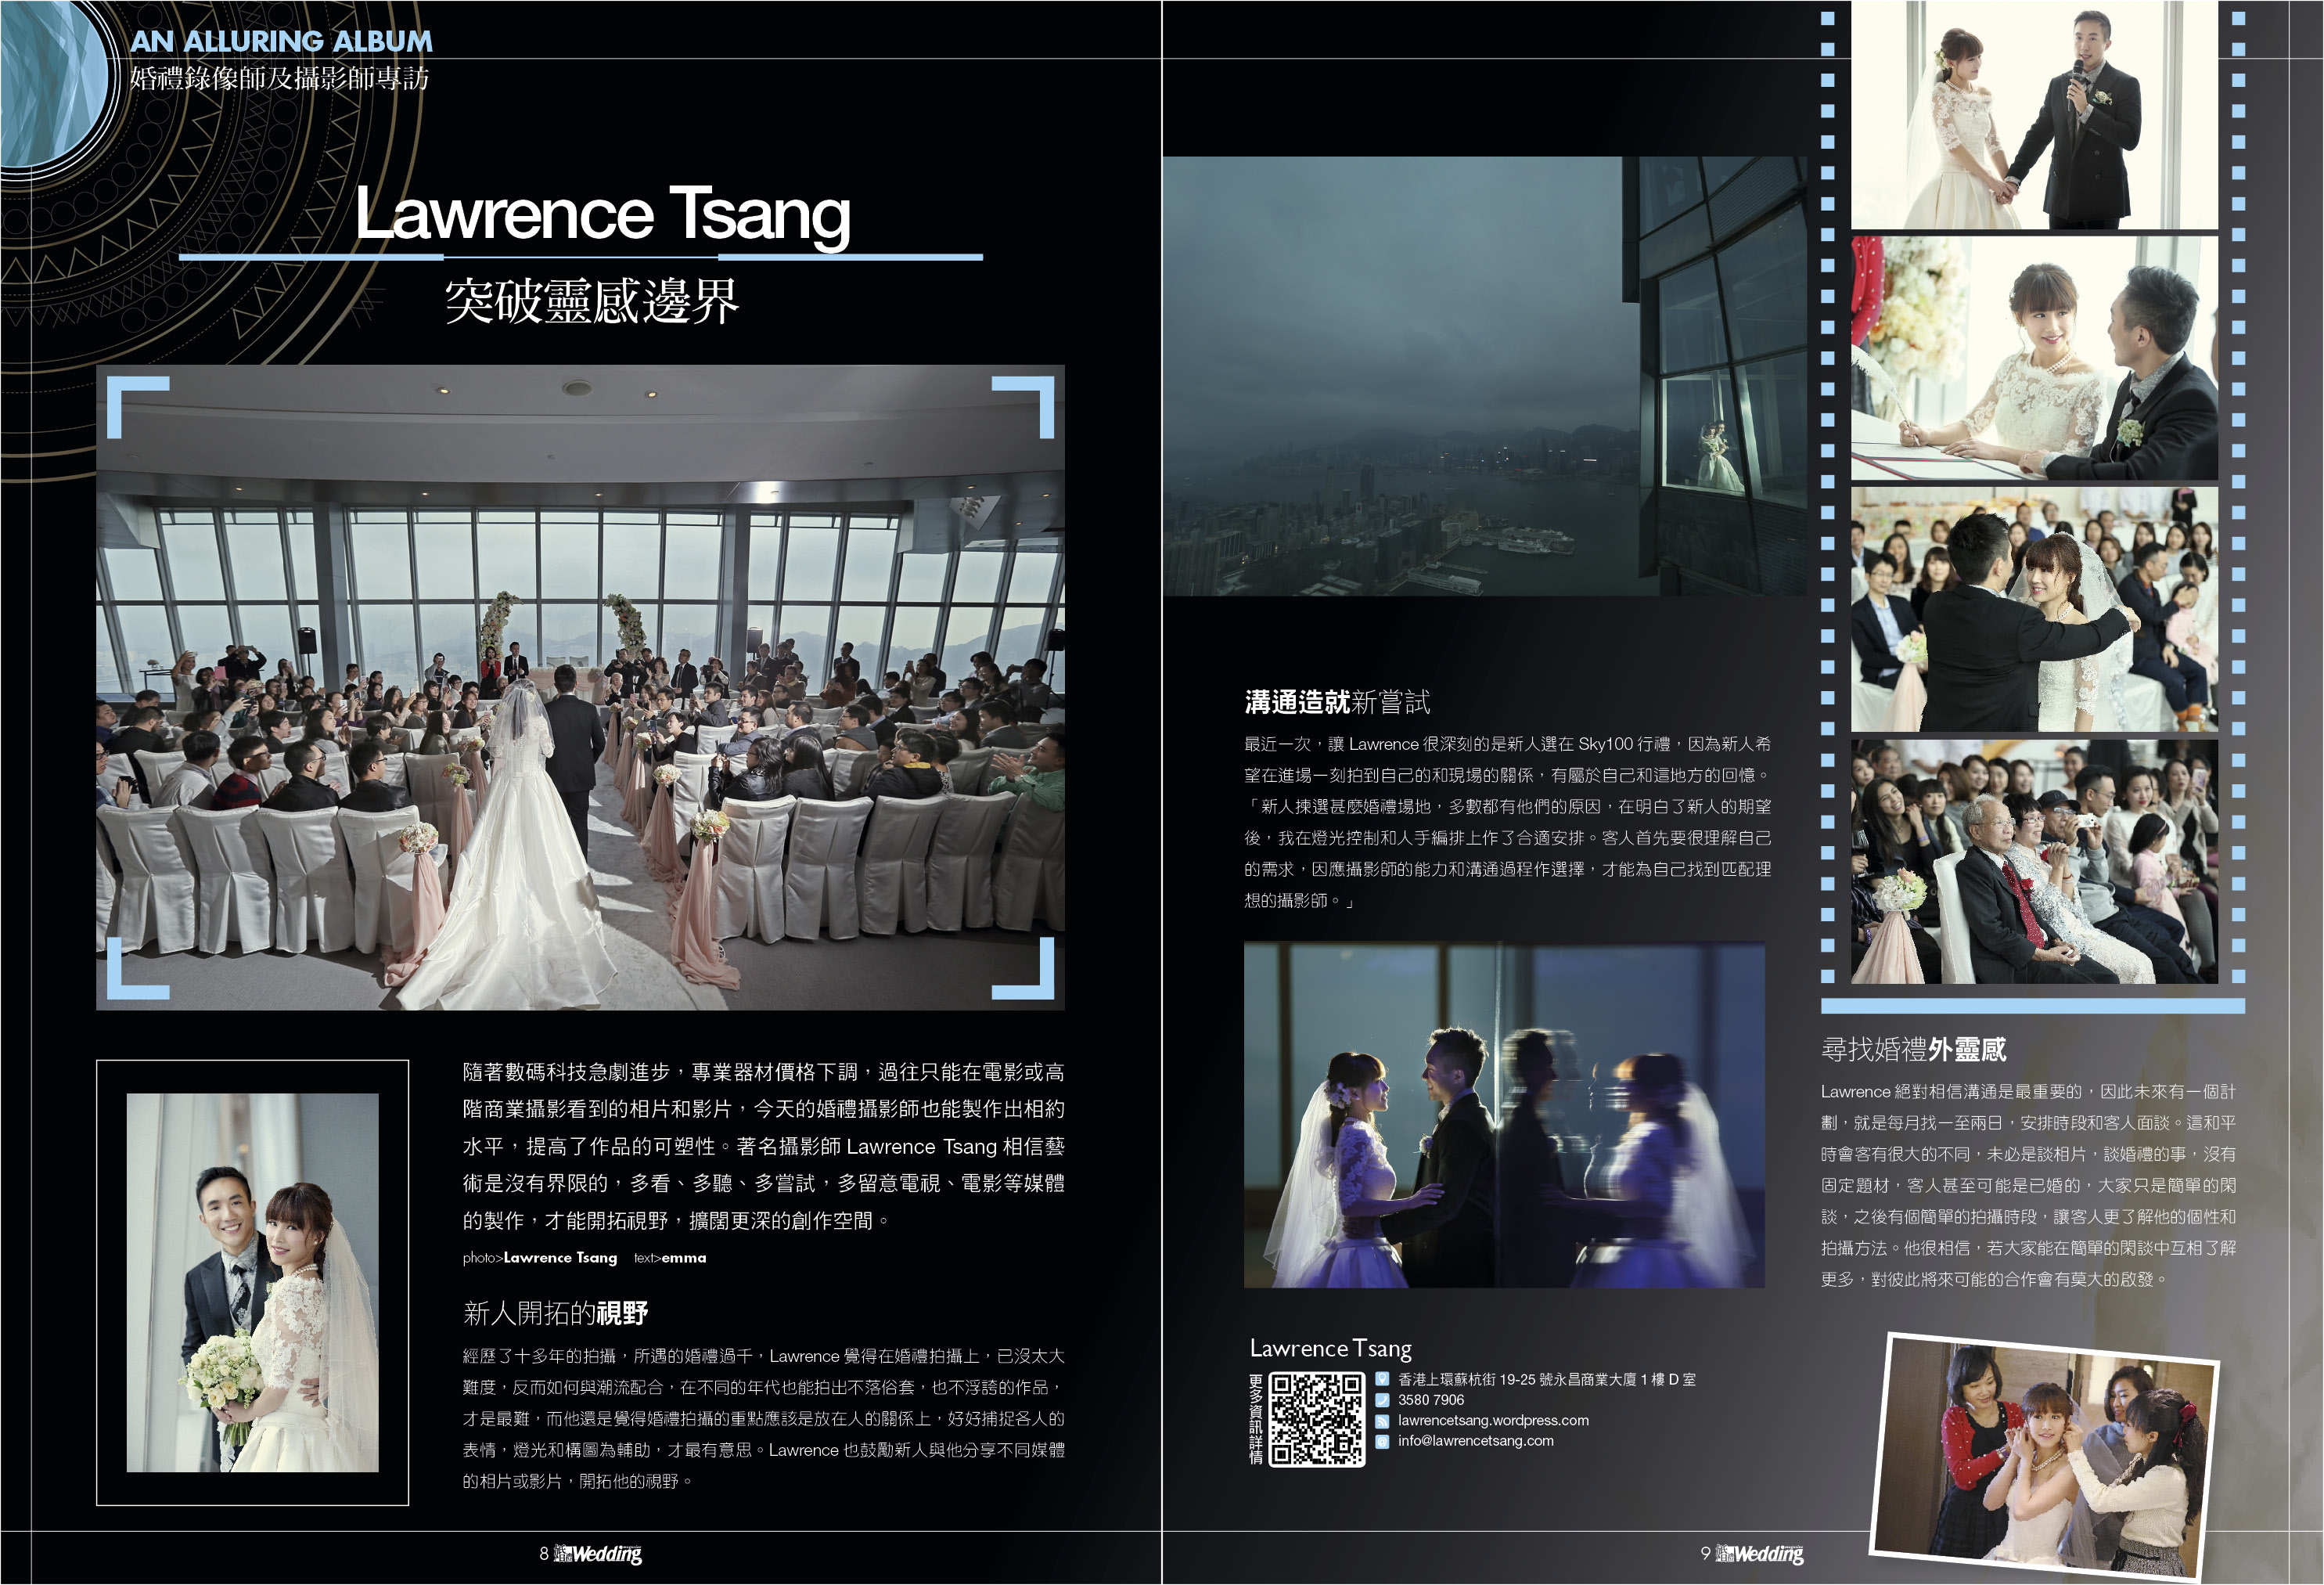 lawrence tsang4.jpg